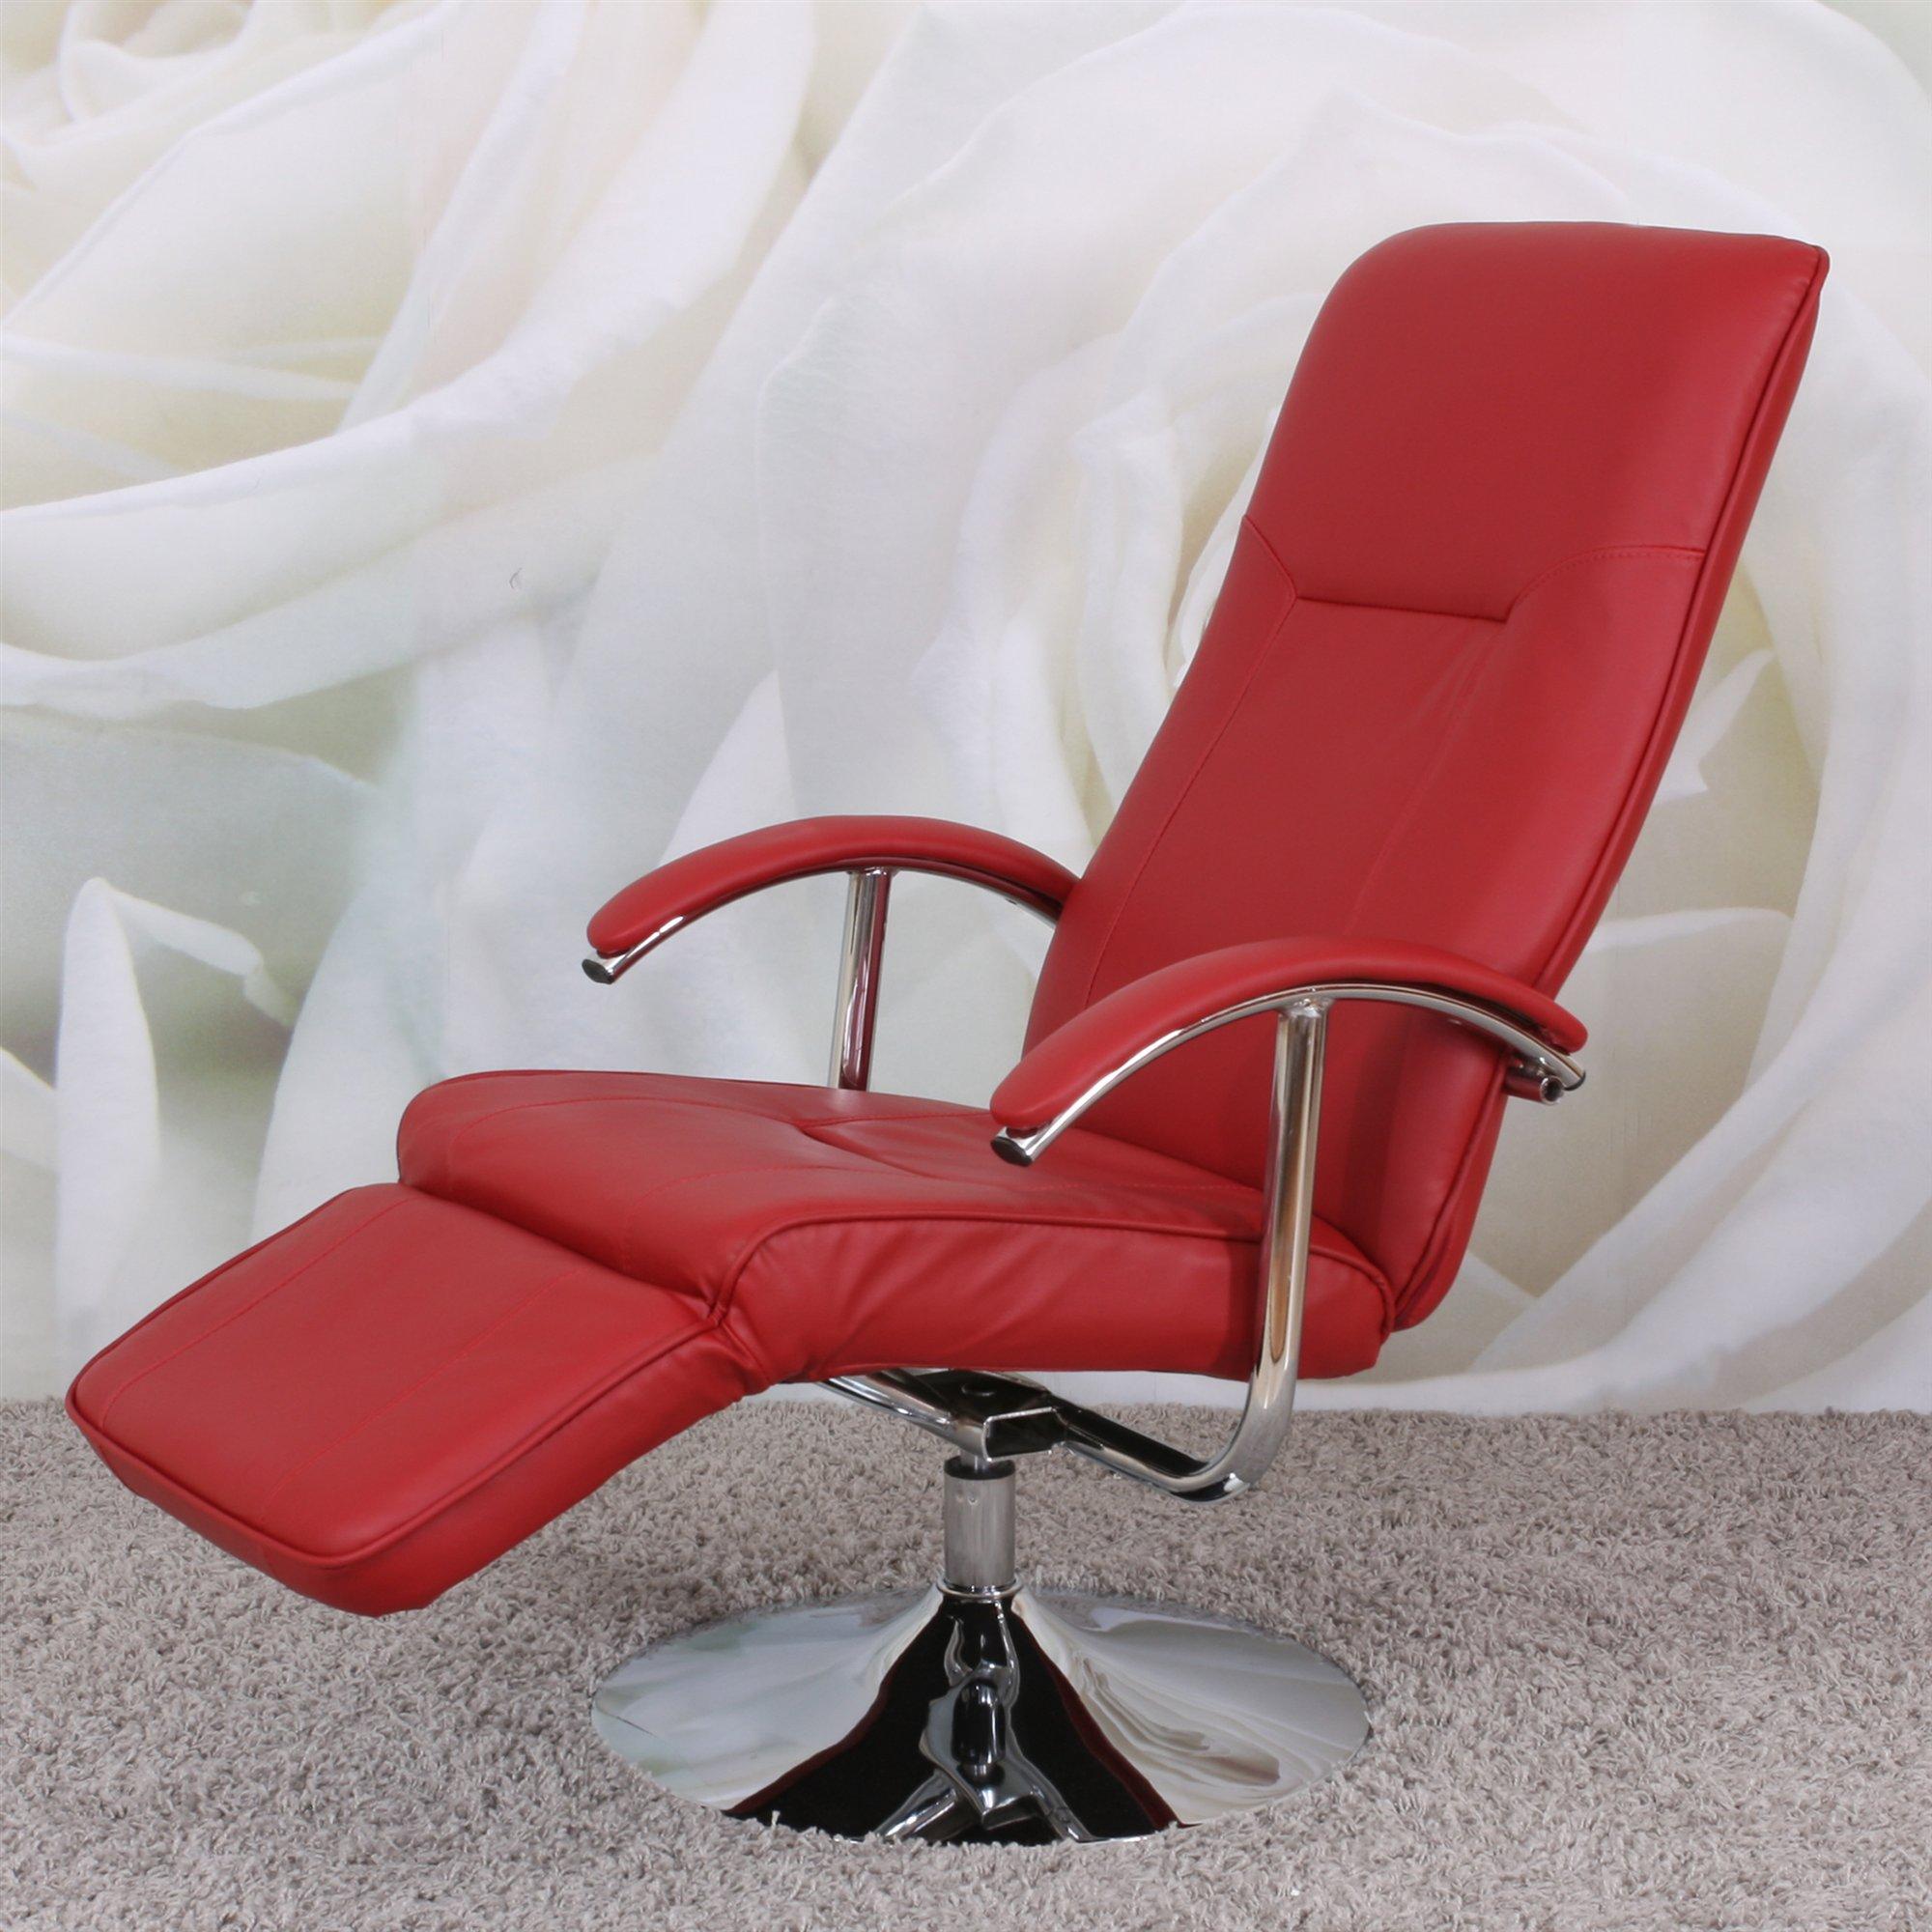 Sill n relax reclinable modelo apia ii en piel color roja - Sillon reclinable piel ...